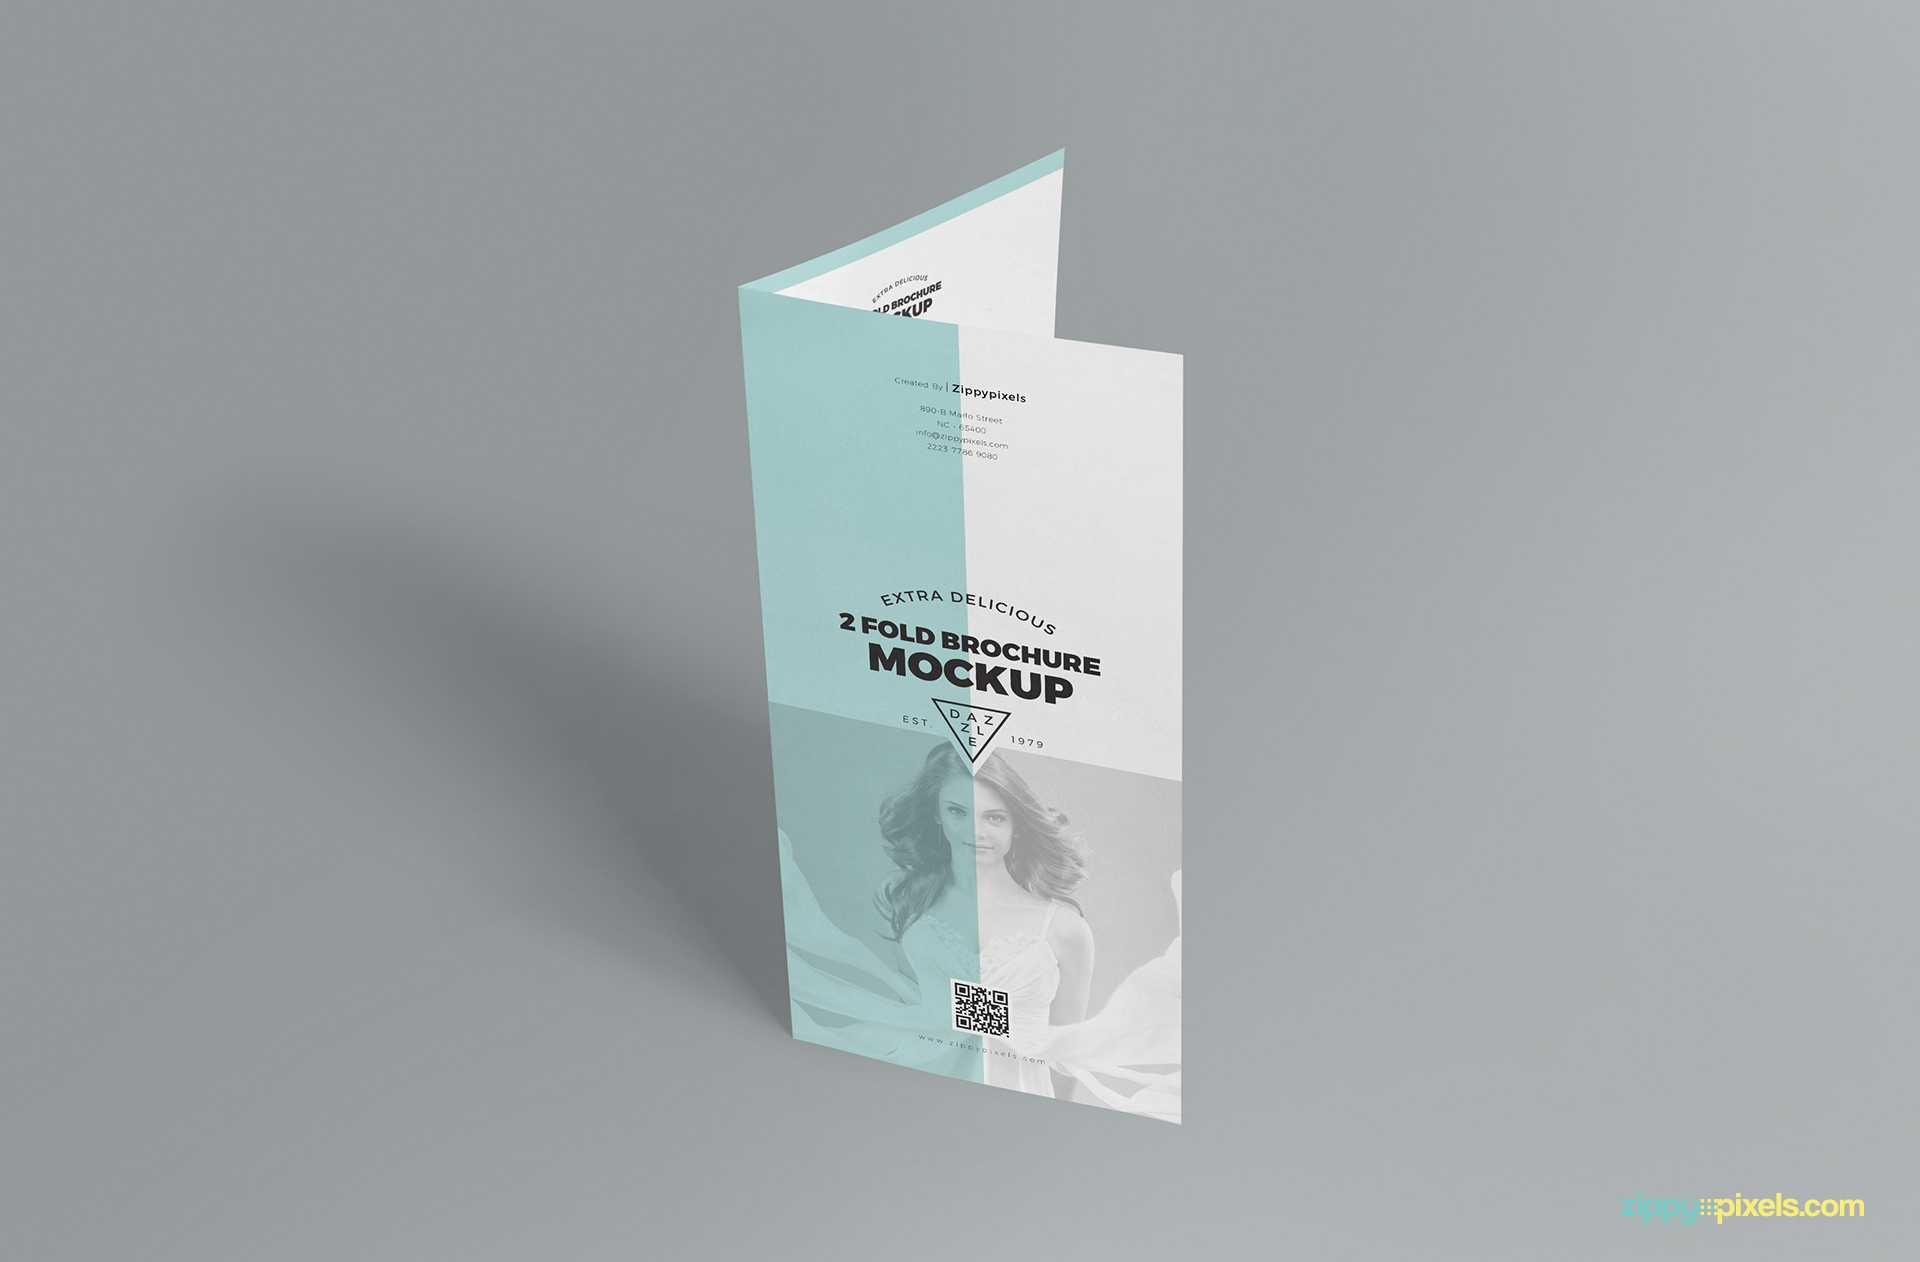 Slick Free 2 Fold Brochure Mockup Psd   Zippypixels In 2 Fold Brochure Template Psd